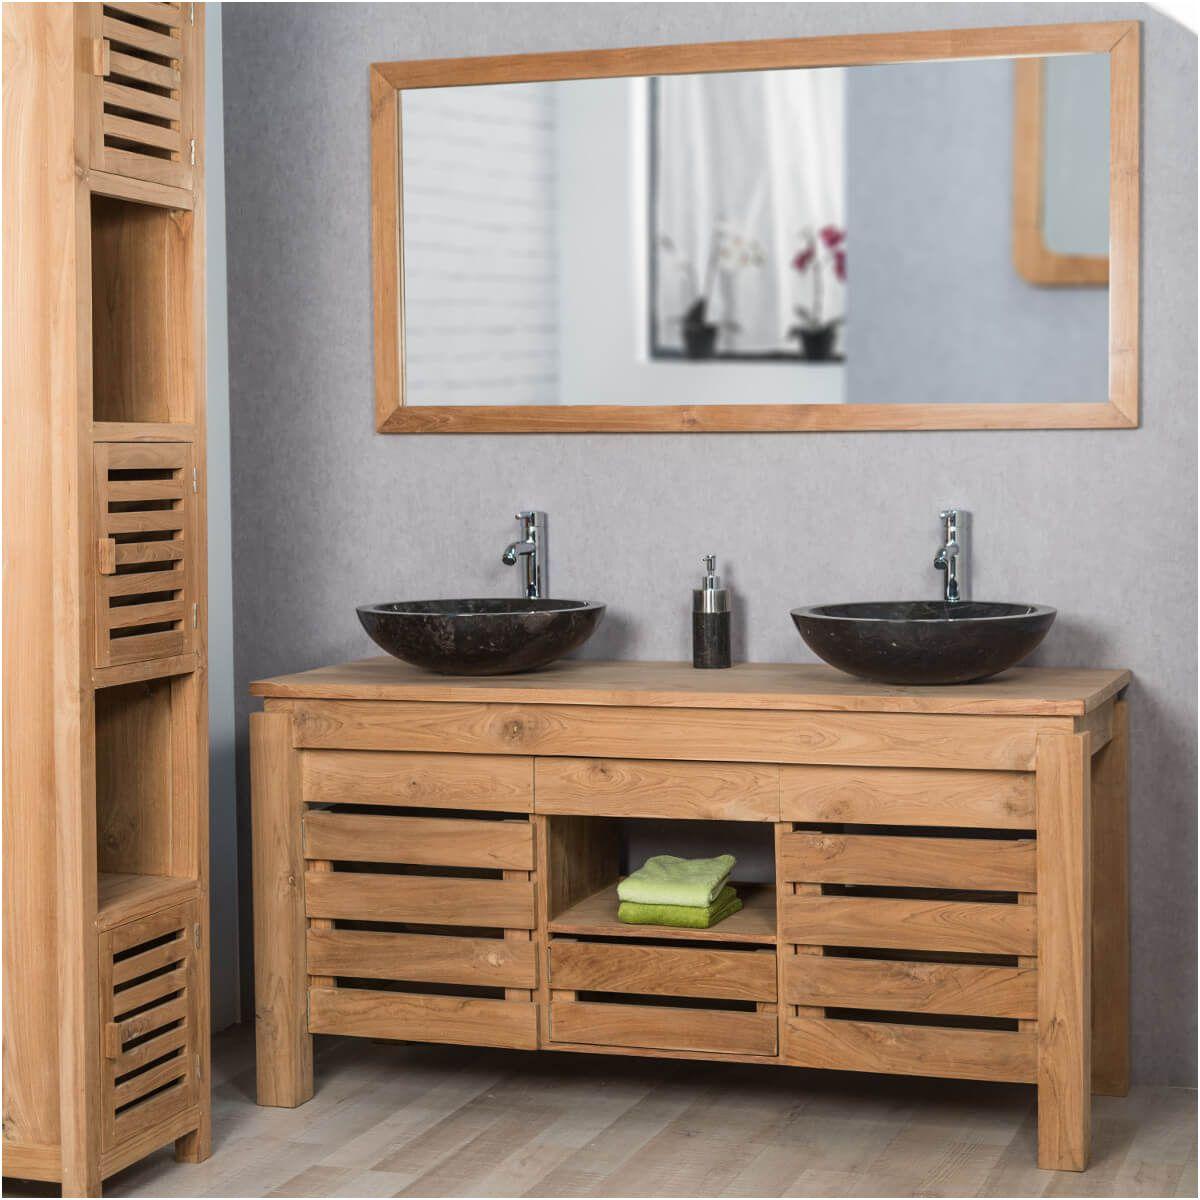 14++ Meuble une vasque salle de bain inspirations